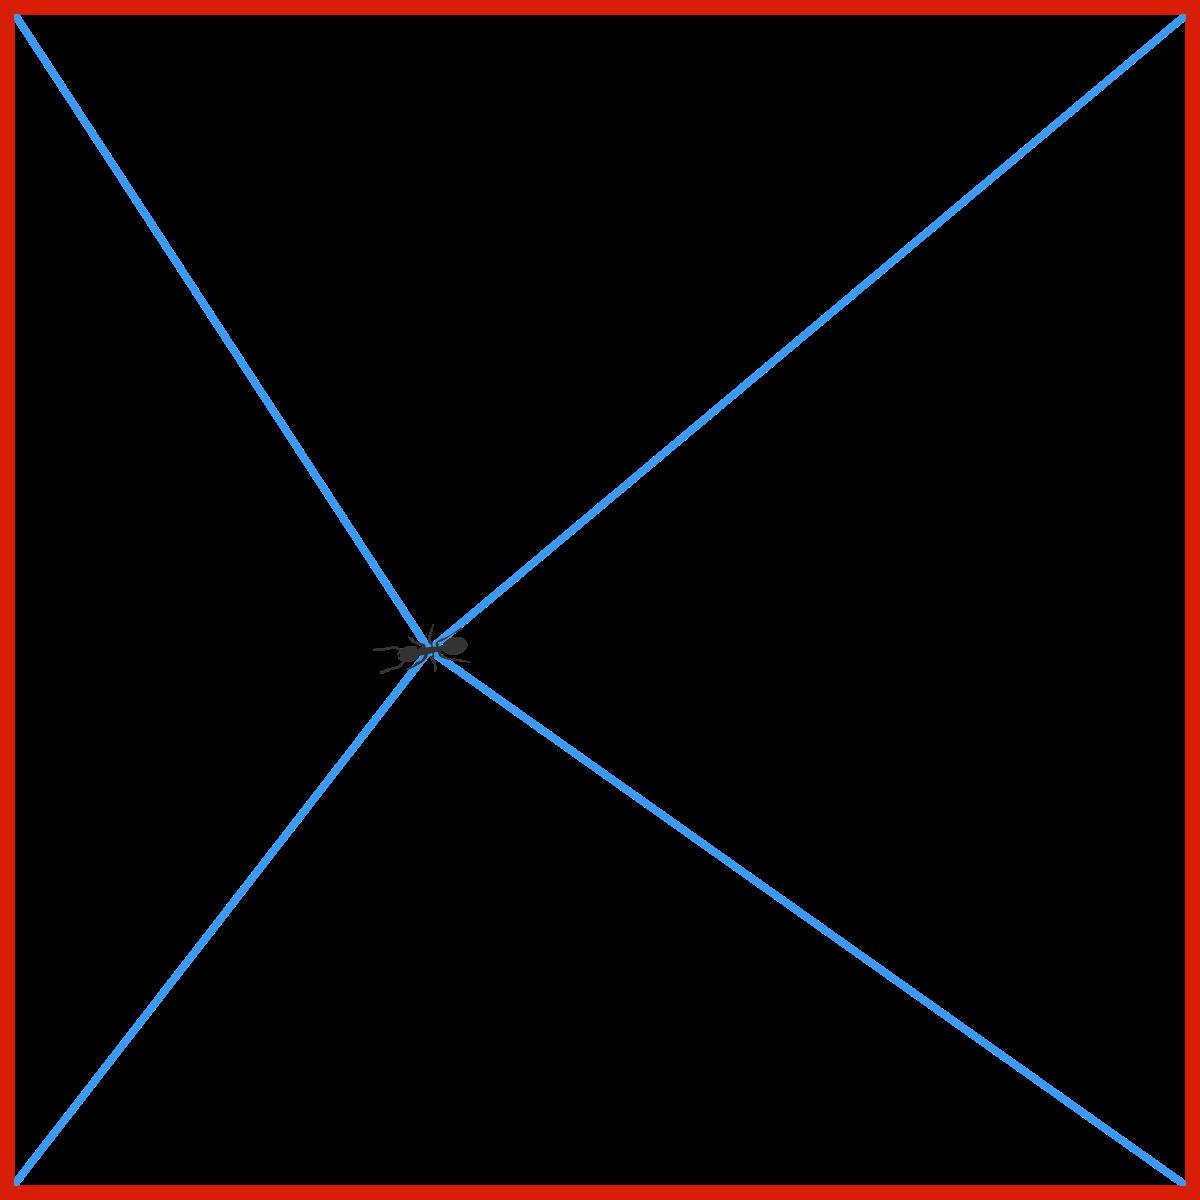 Cosine Rule Law Of Cosines Brilliant Math Science Wiki